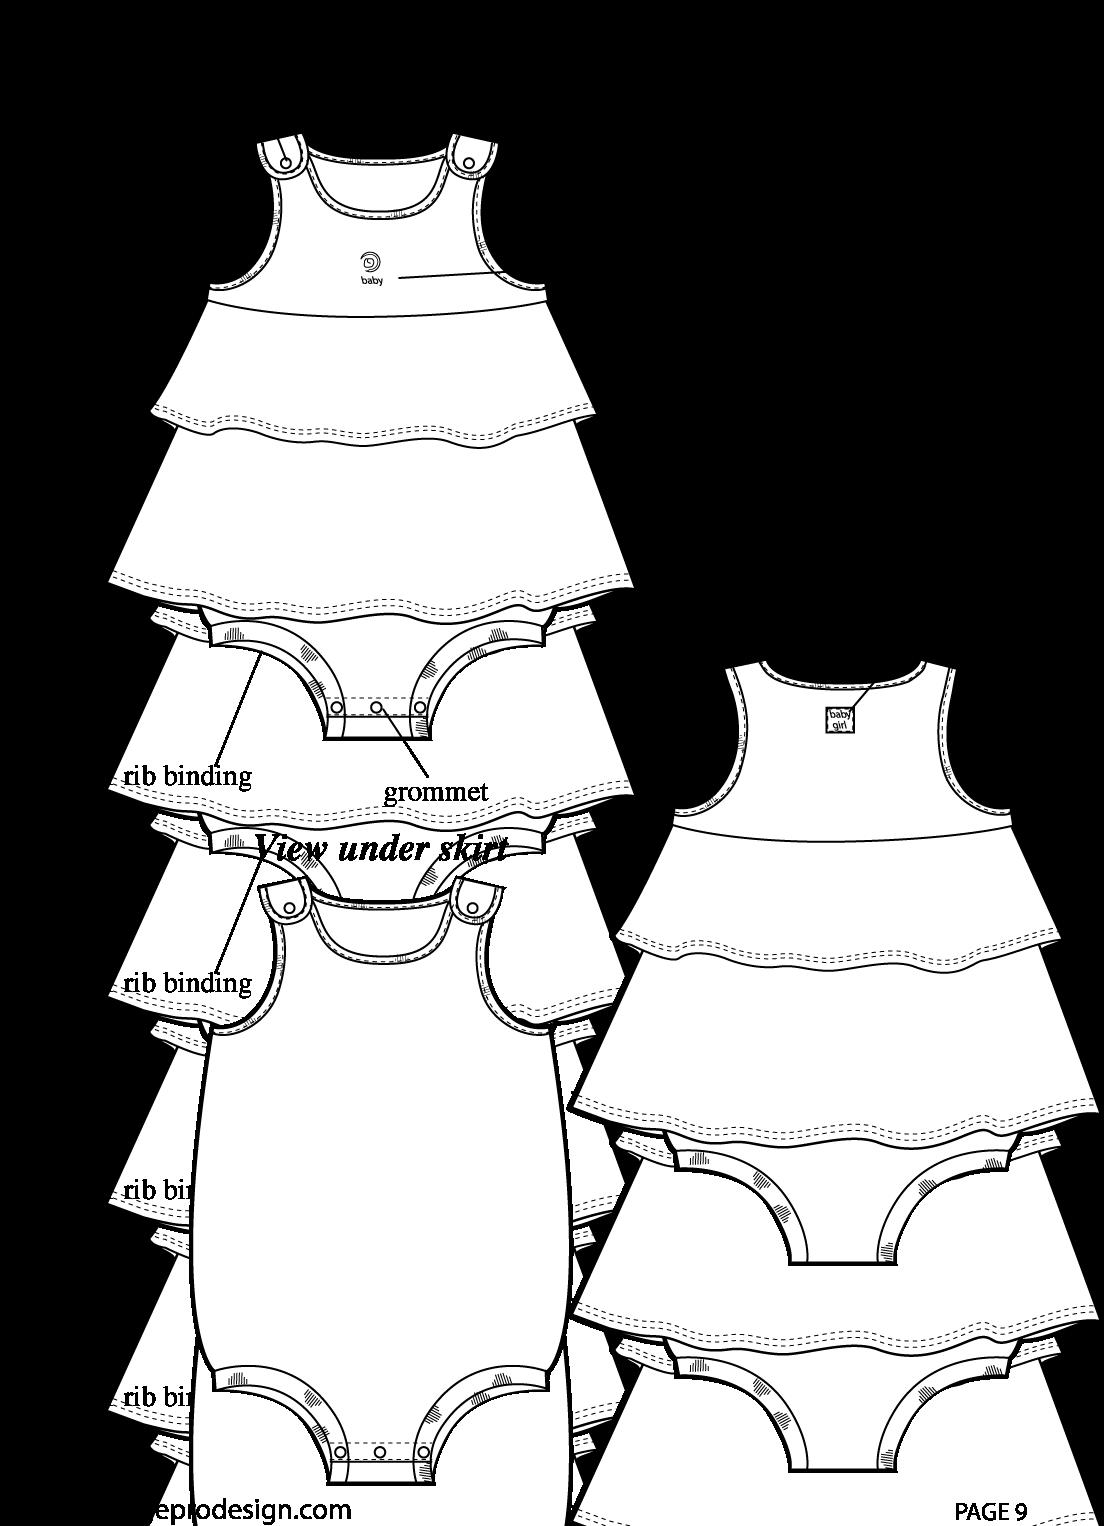 Illustrator For Kids Clothes Pattern Making And Kids Romper Flat Sketch Full Size Png Download Seekpng